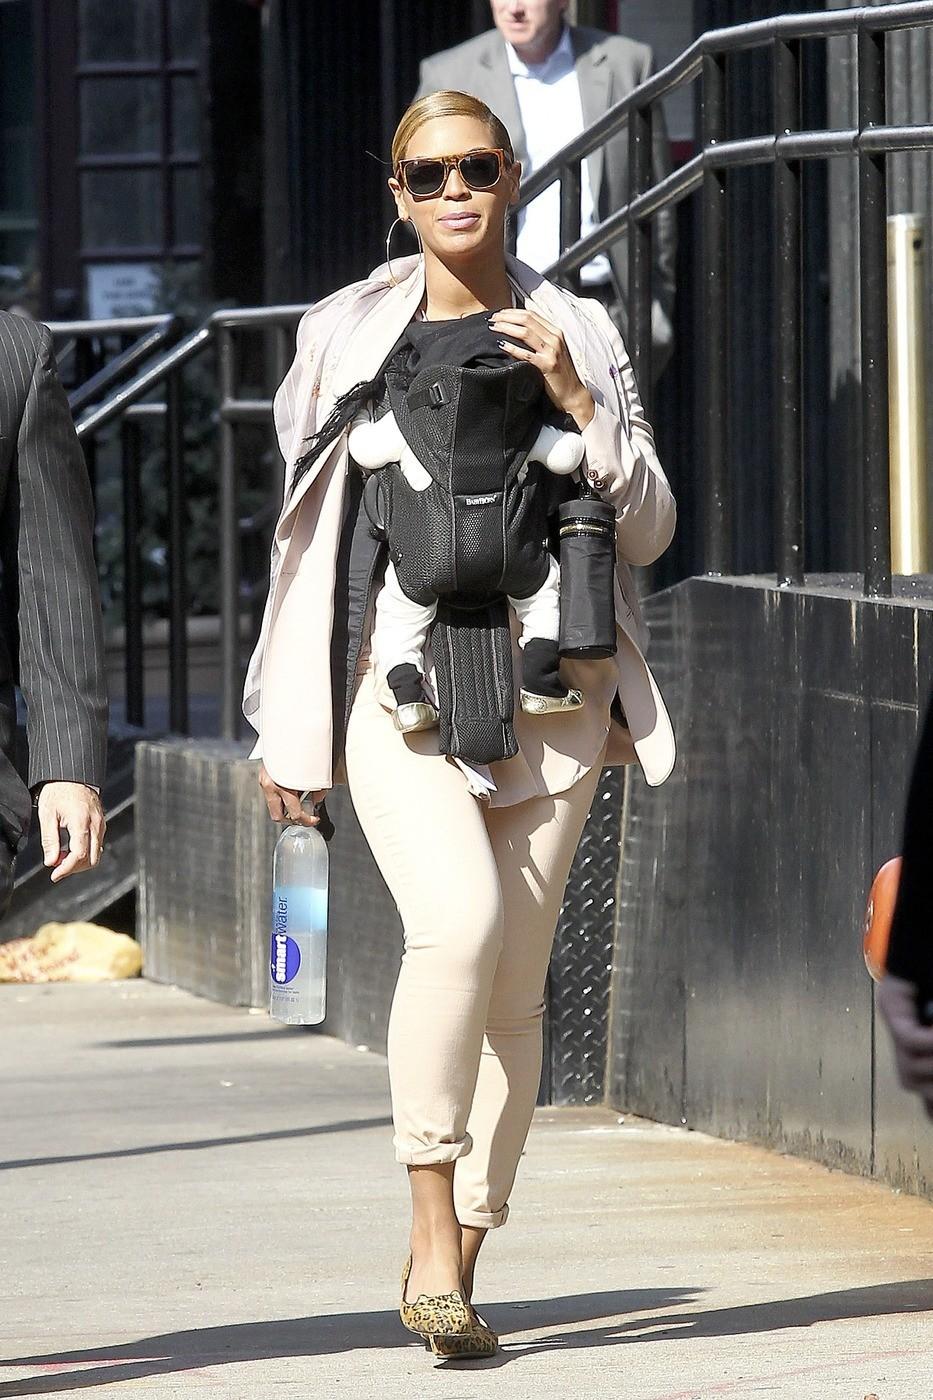 74676PCN_Beyonce06.jpg